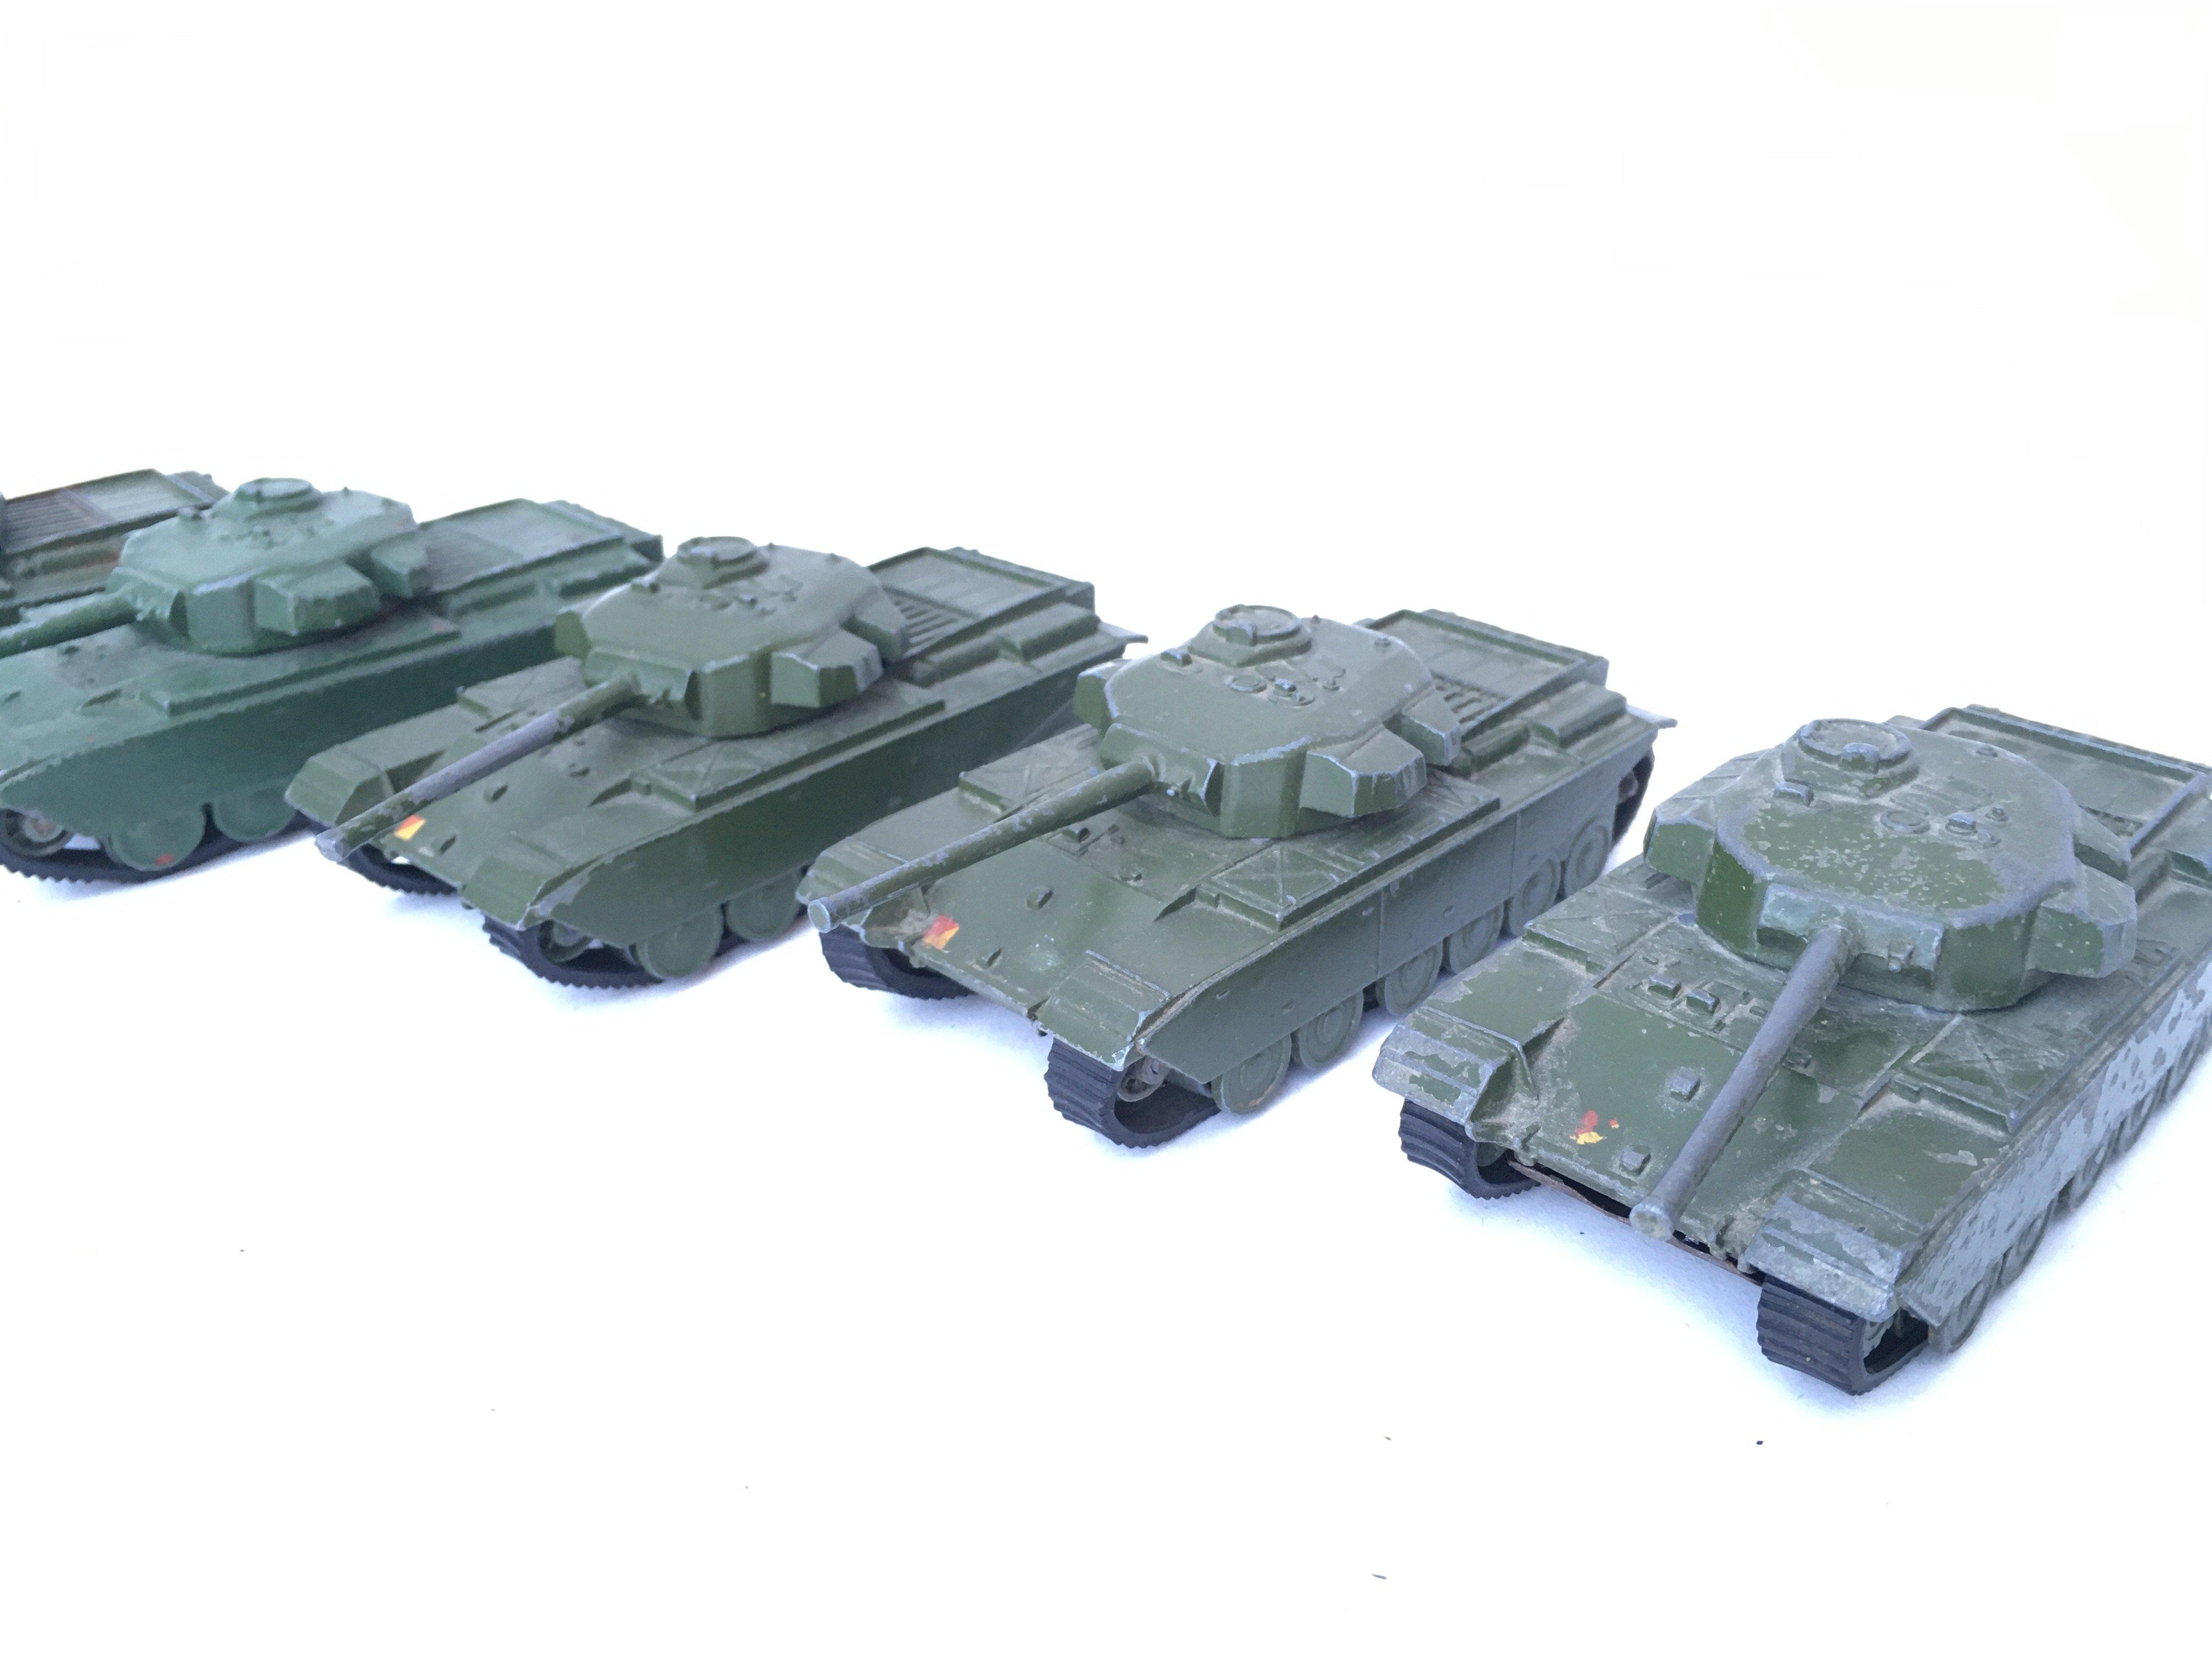 5 X Dinky Supertoys Centurion Tanks. #651.(1 re-pa - Image 4 of 4